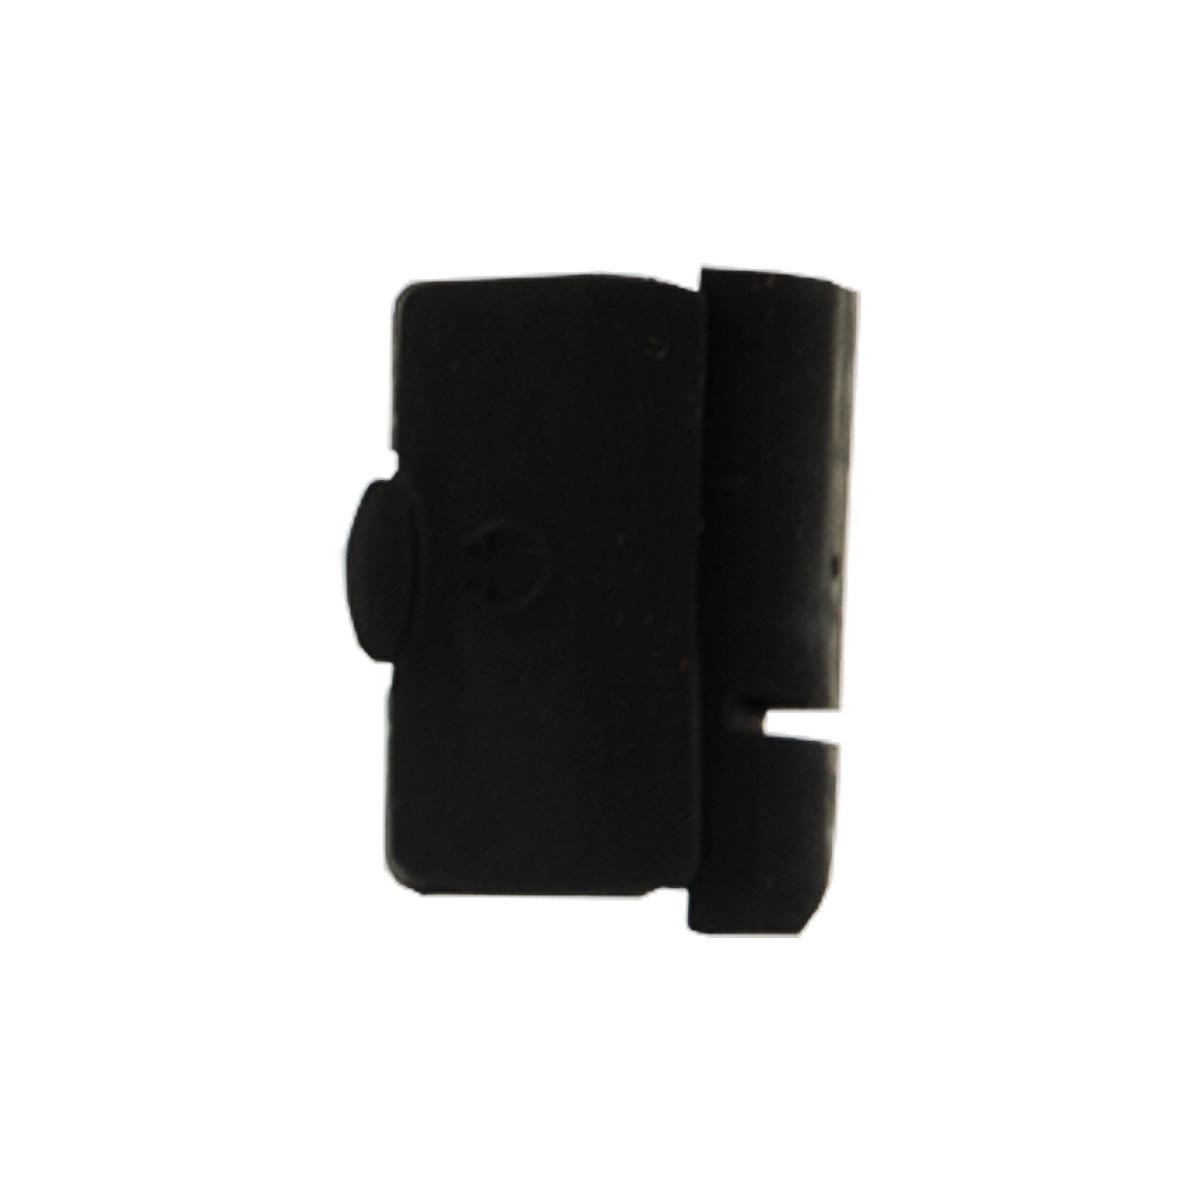 0703-0149, Headphone Socket Cover for X-TERRA Series